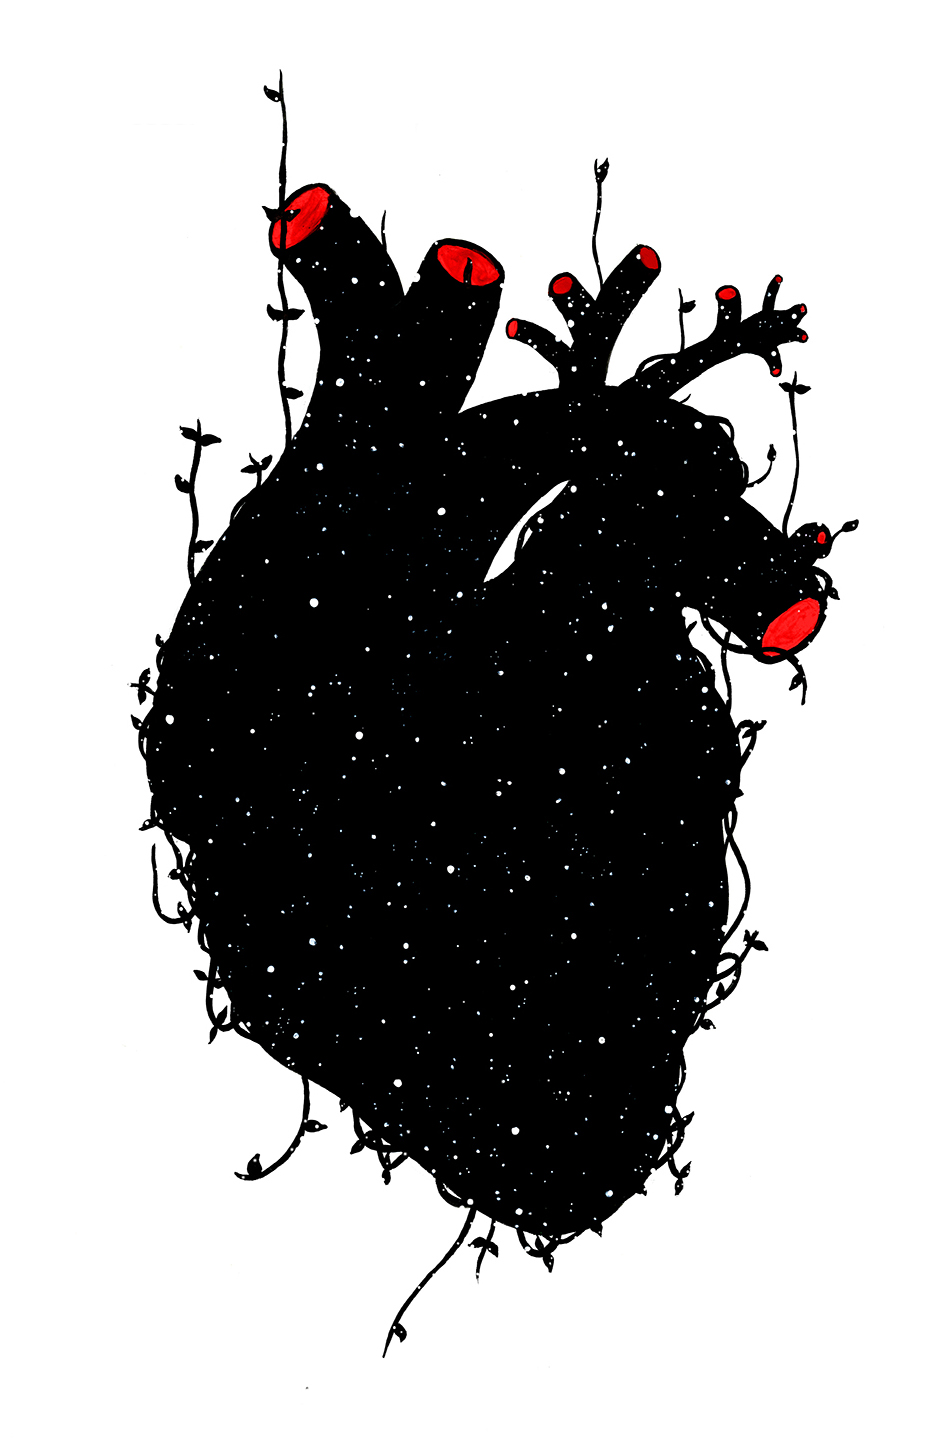 #saatchiartfeature #artistoftheday #contemporarydrawing #contemporarypainting  #bloodart#worksonpaper #emptycapsulesart #noumeda #art #love #paper #contenmporaryartist #italianartost #emergingartis #saatchiartist #cosmos